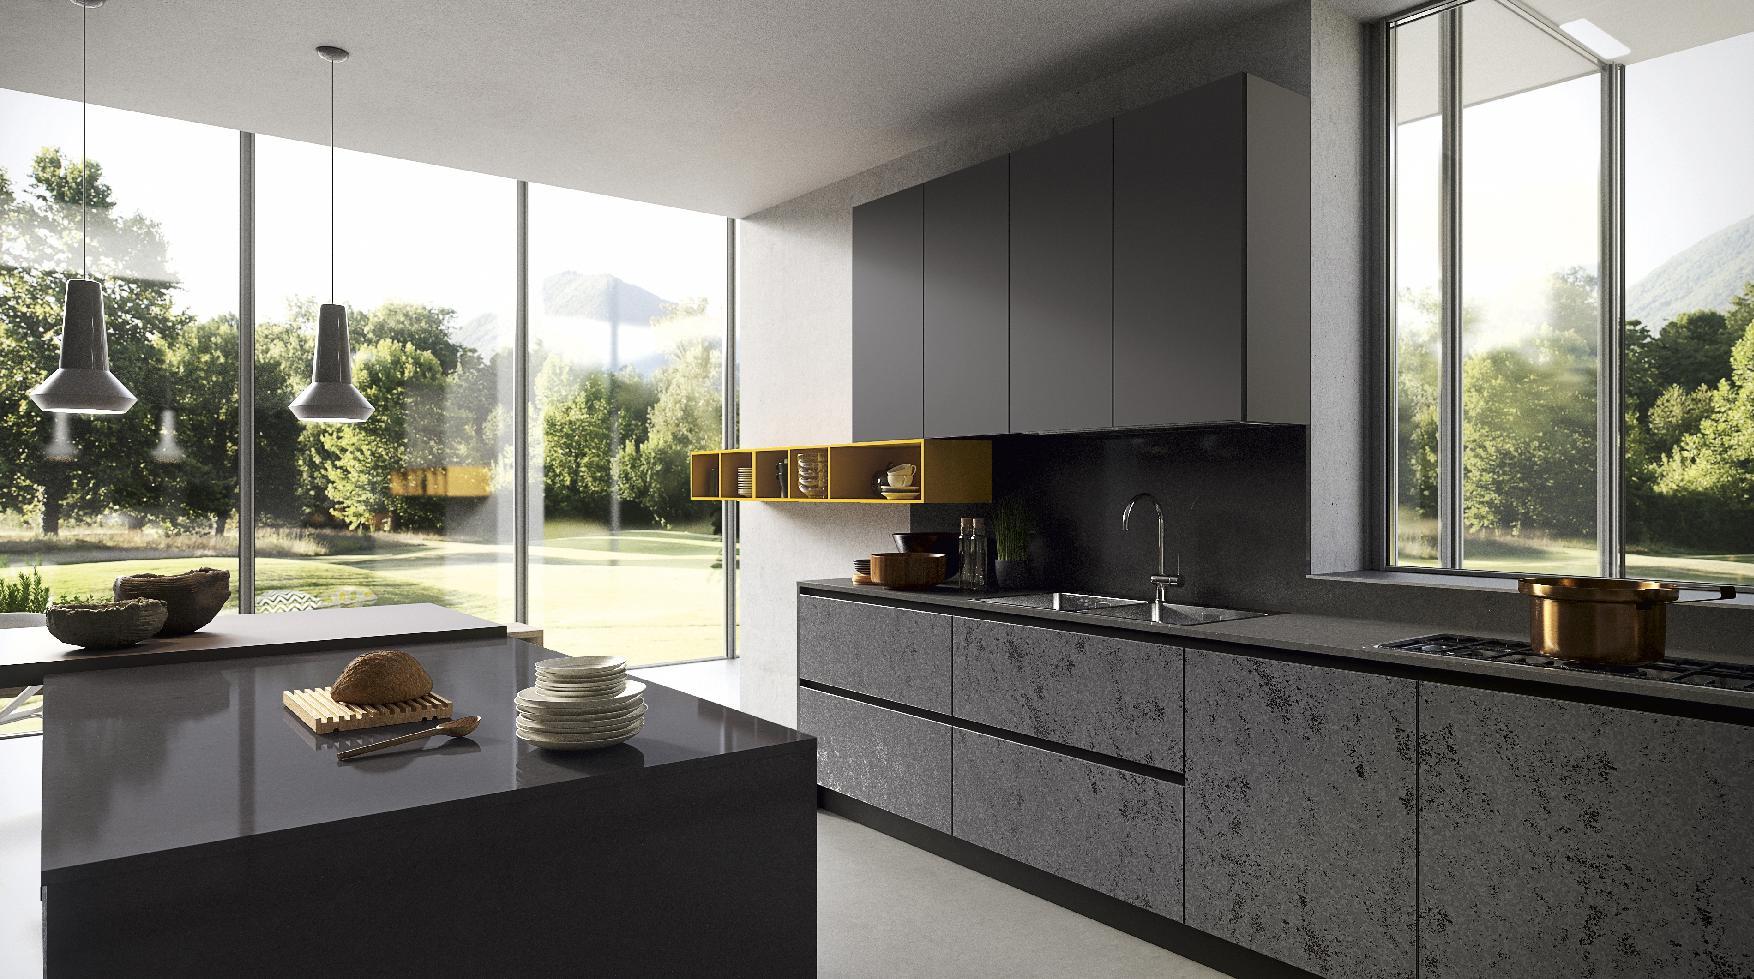 Arredo3 Cucine Moderne.Cucine Moderne A Carbonia Iglesias Con Arredo3 Show Room